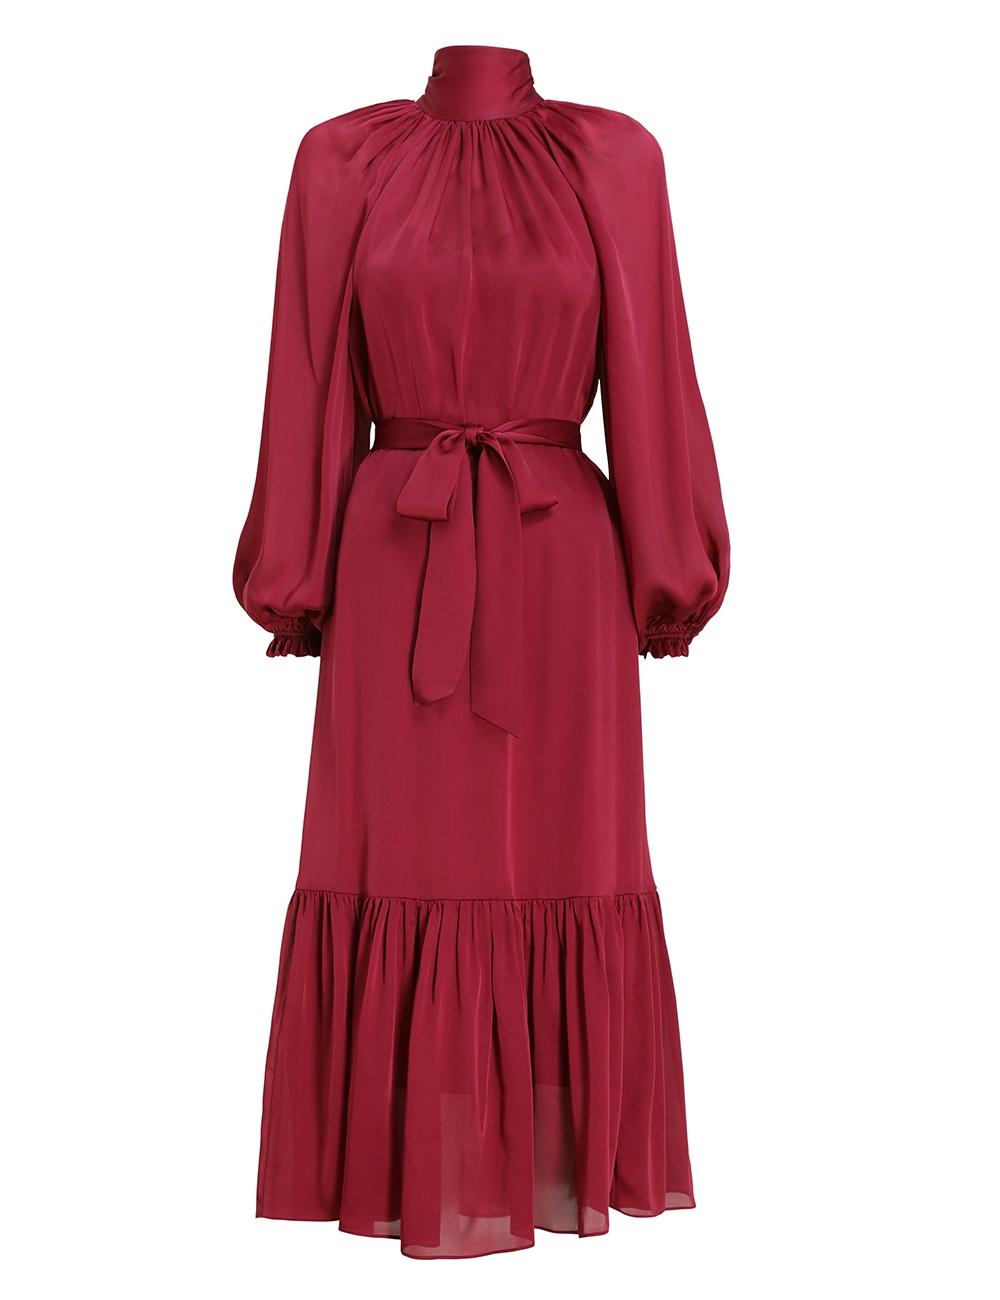 Gathered Bow Long Sleeve Dress